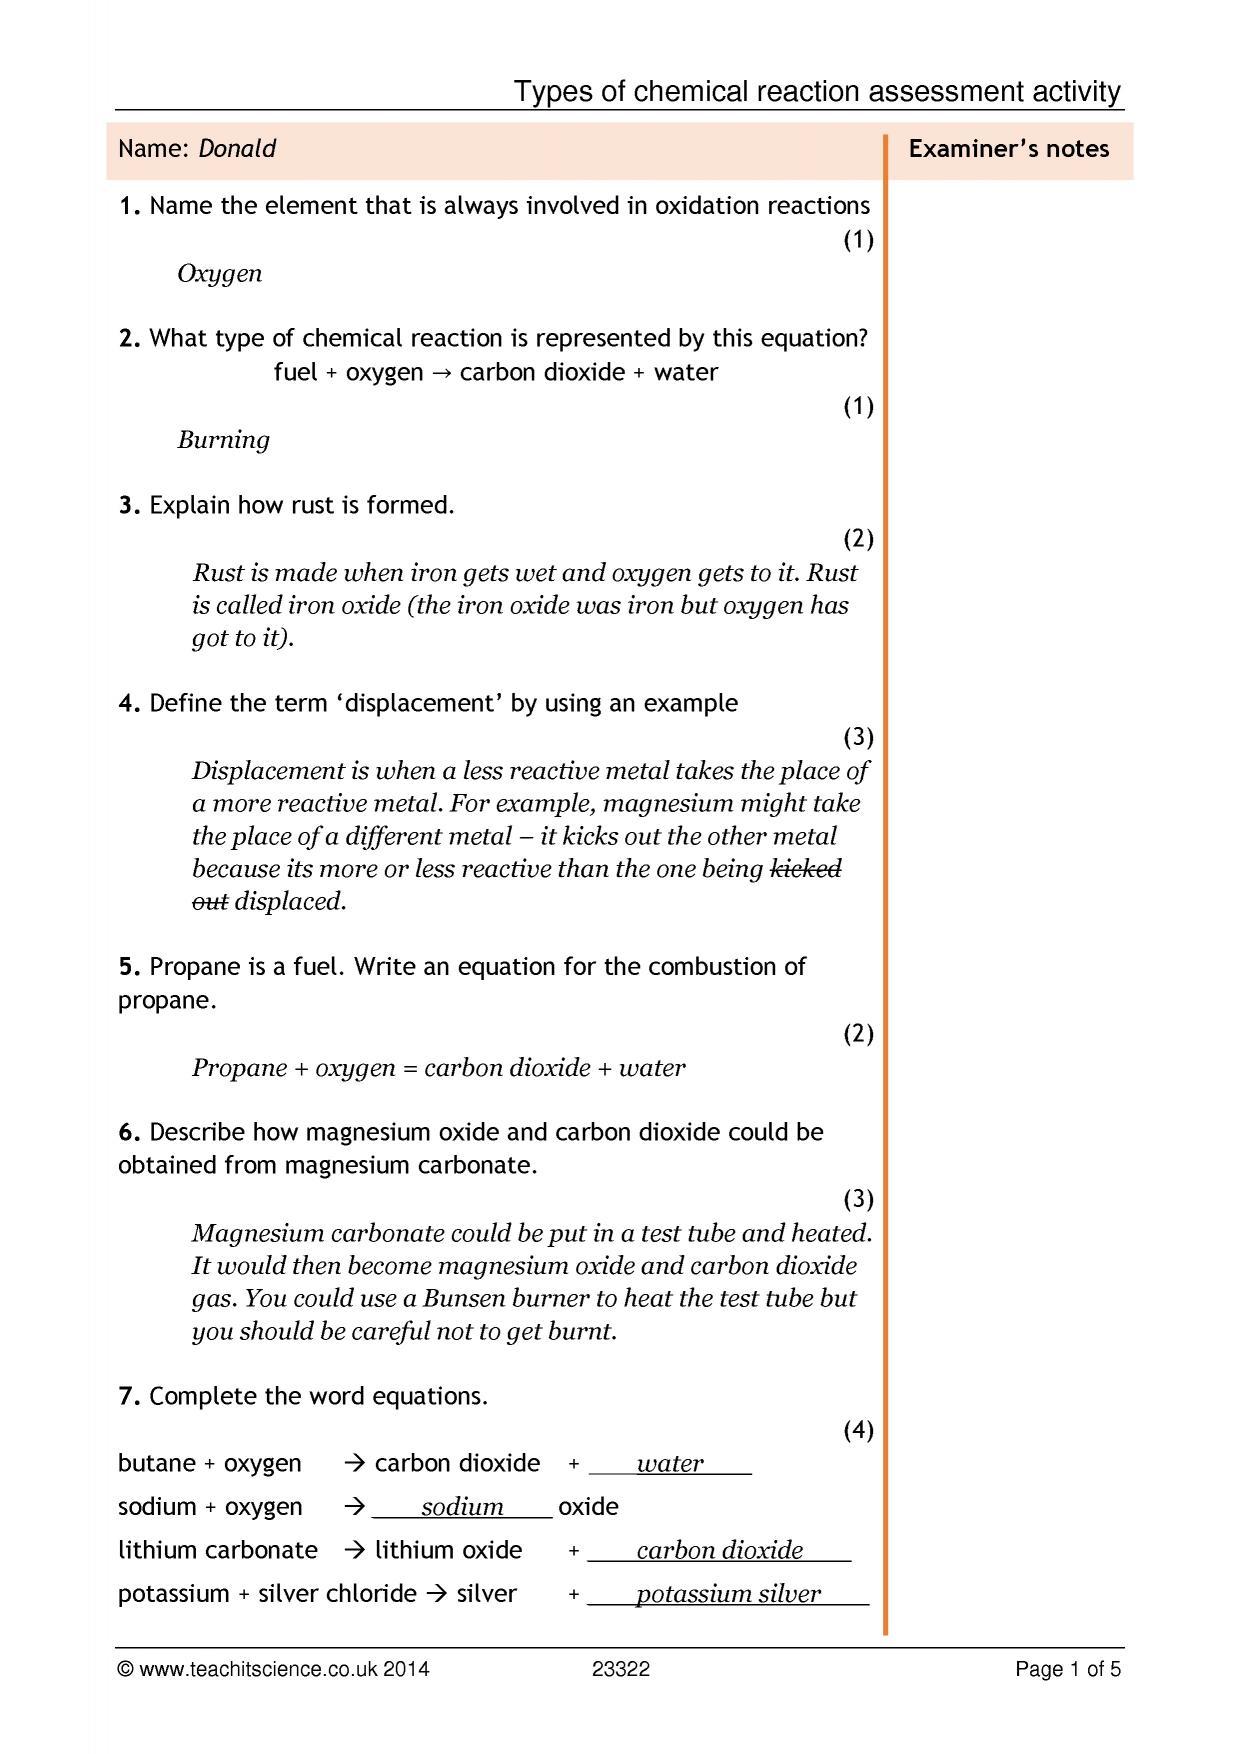 Word Equations Worksheet Ks3